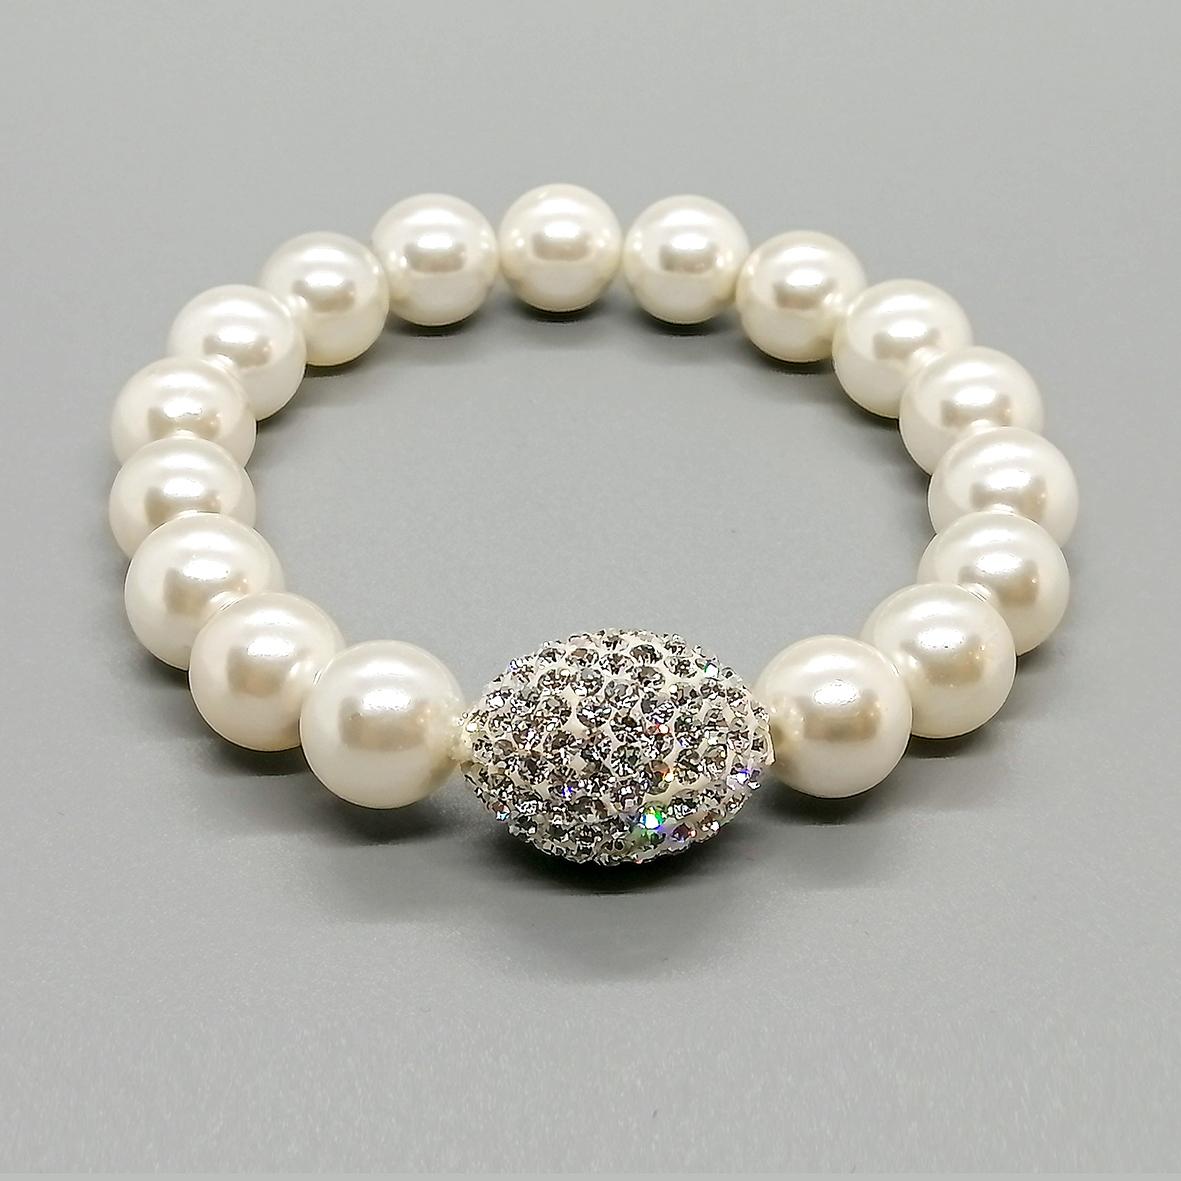 Diamonte Oval Shell Pearls 01 IMG_20210614_145351.jpg